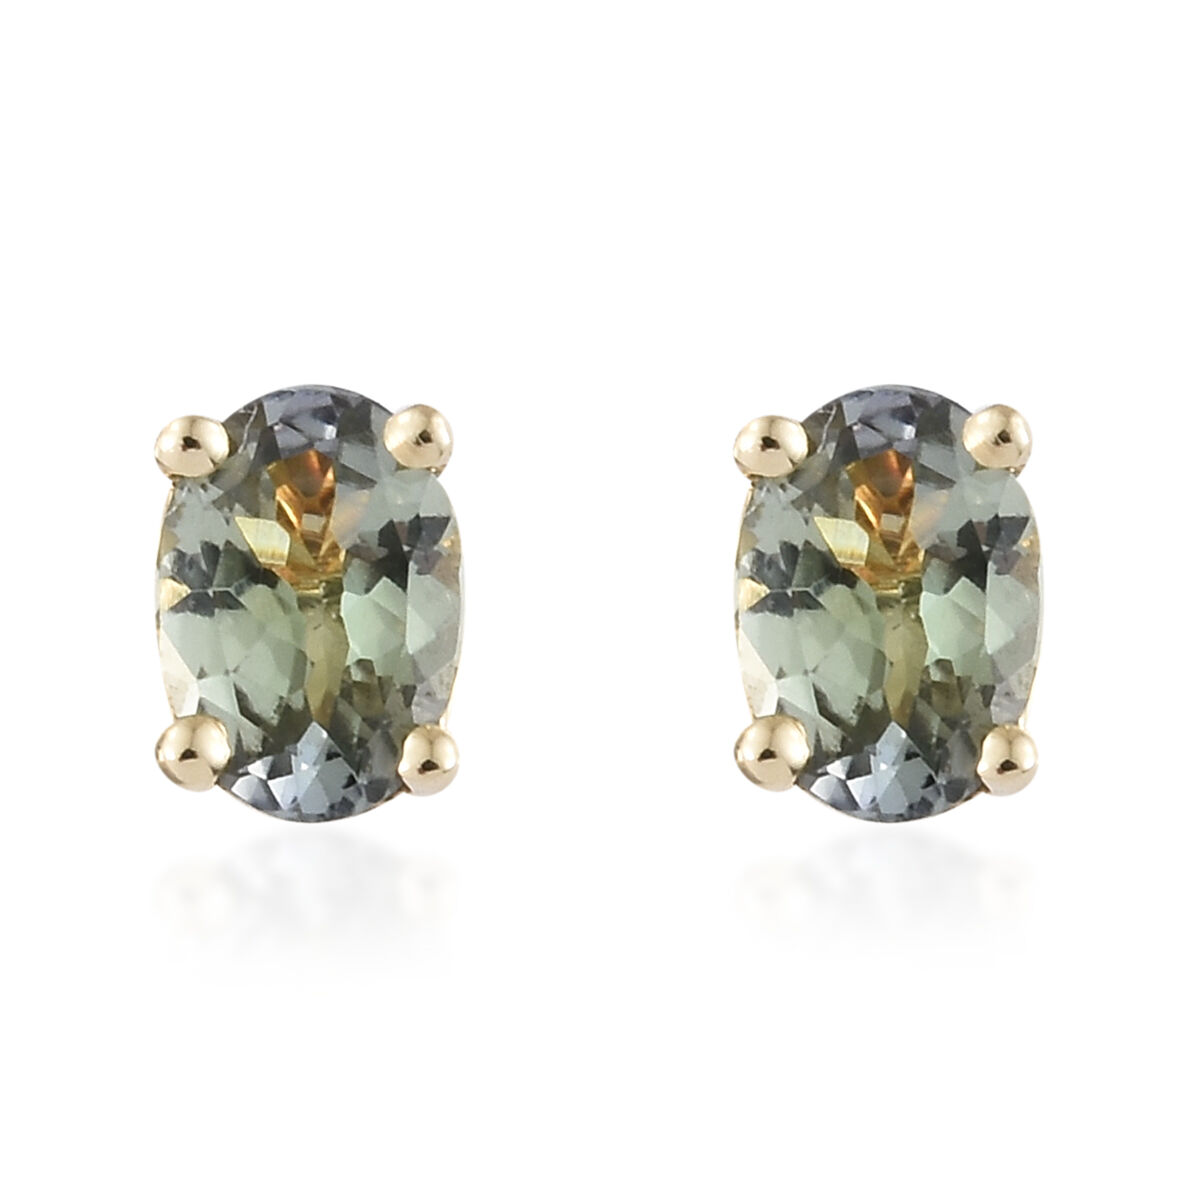 1 Carat AA Green Tanzanite Solitaire Stud Earrings in 9K